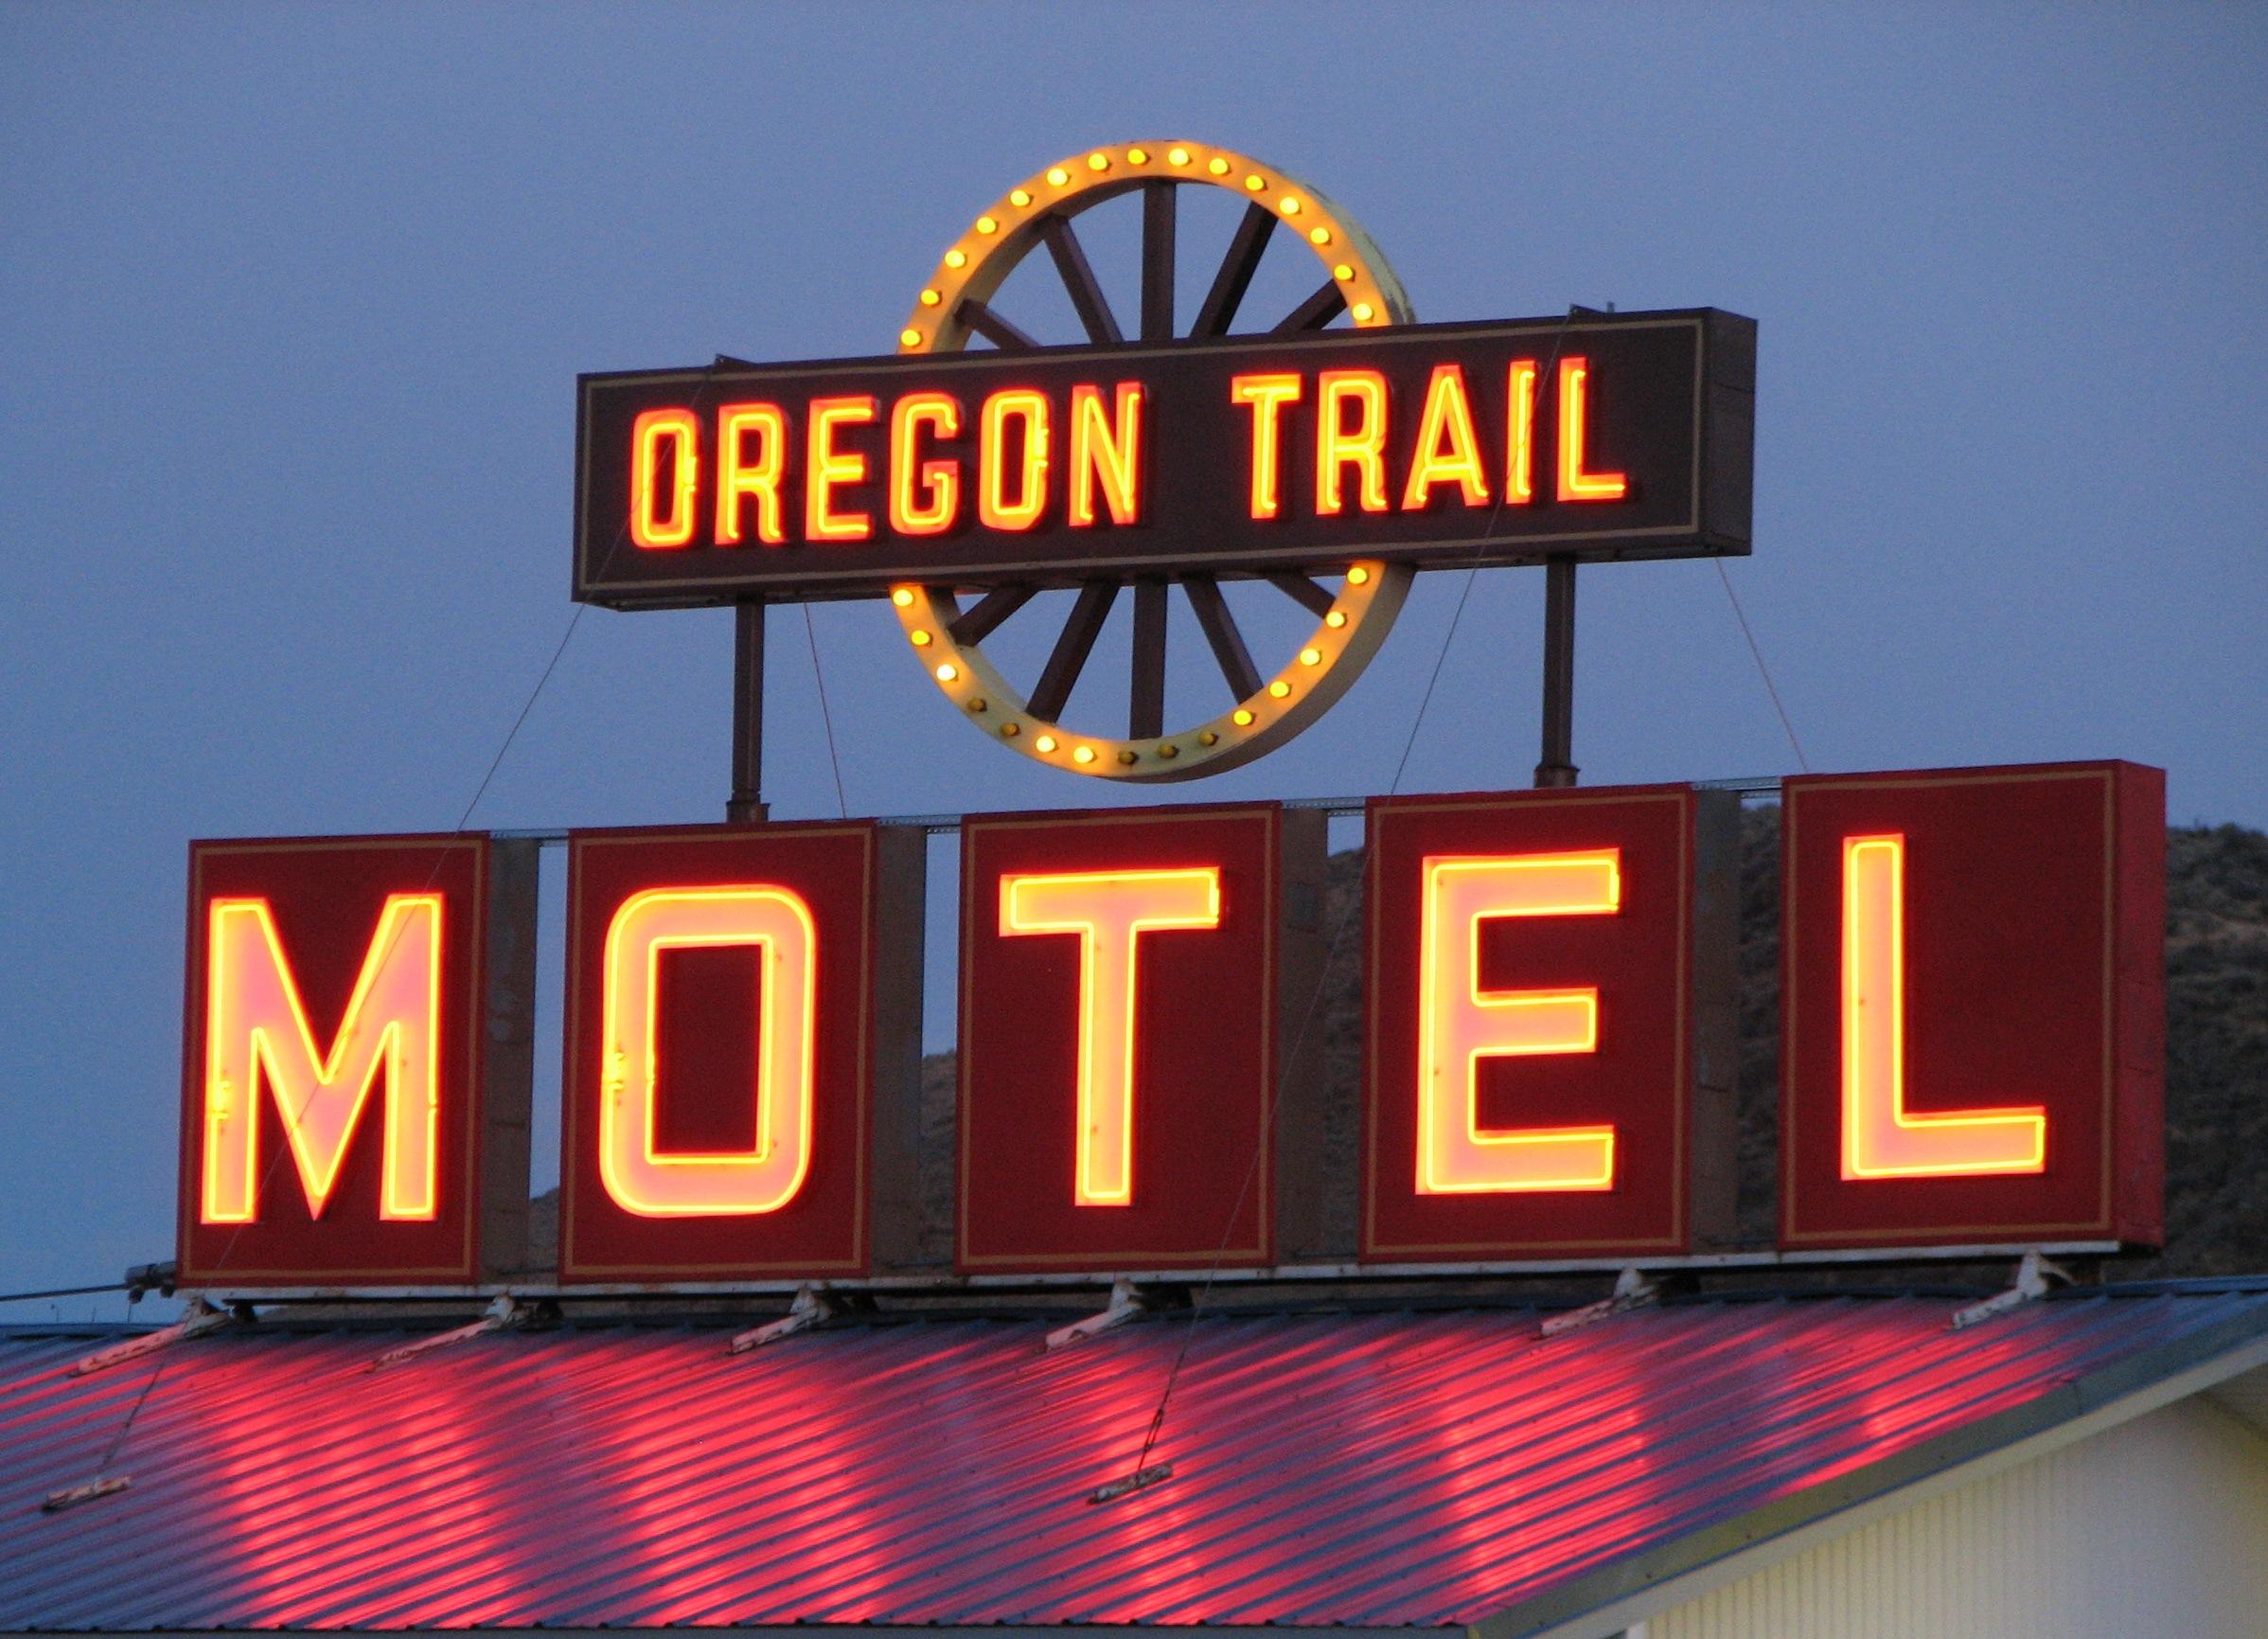 Oregon Trail Motel and Restaurant - 211 Bridge Street, Baker City, Oregon U.S.A. - November 7, 2010